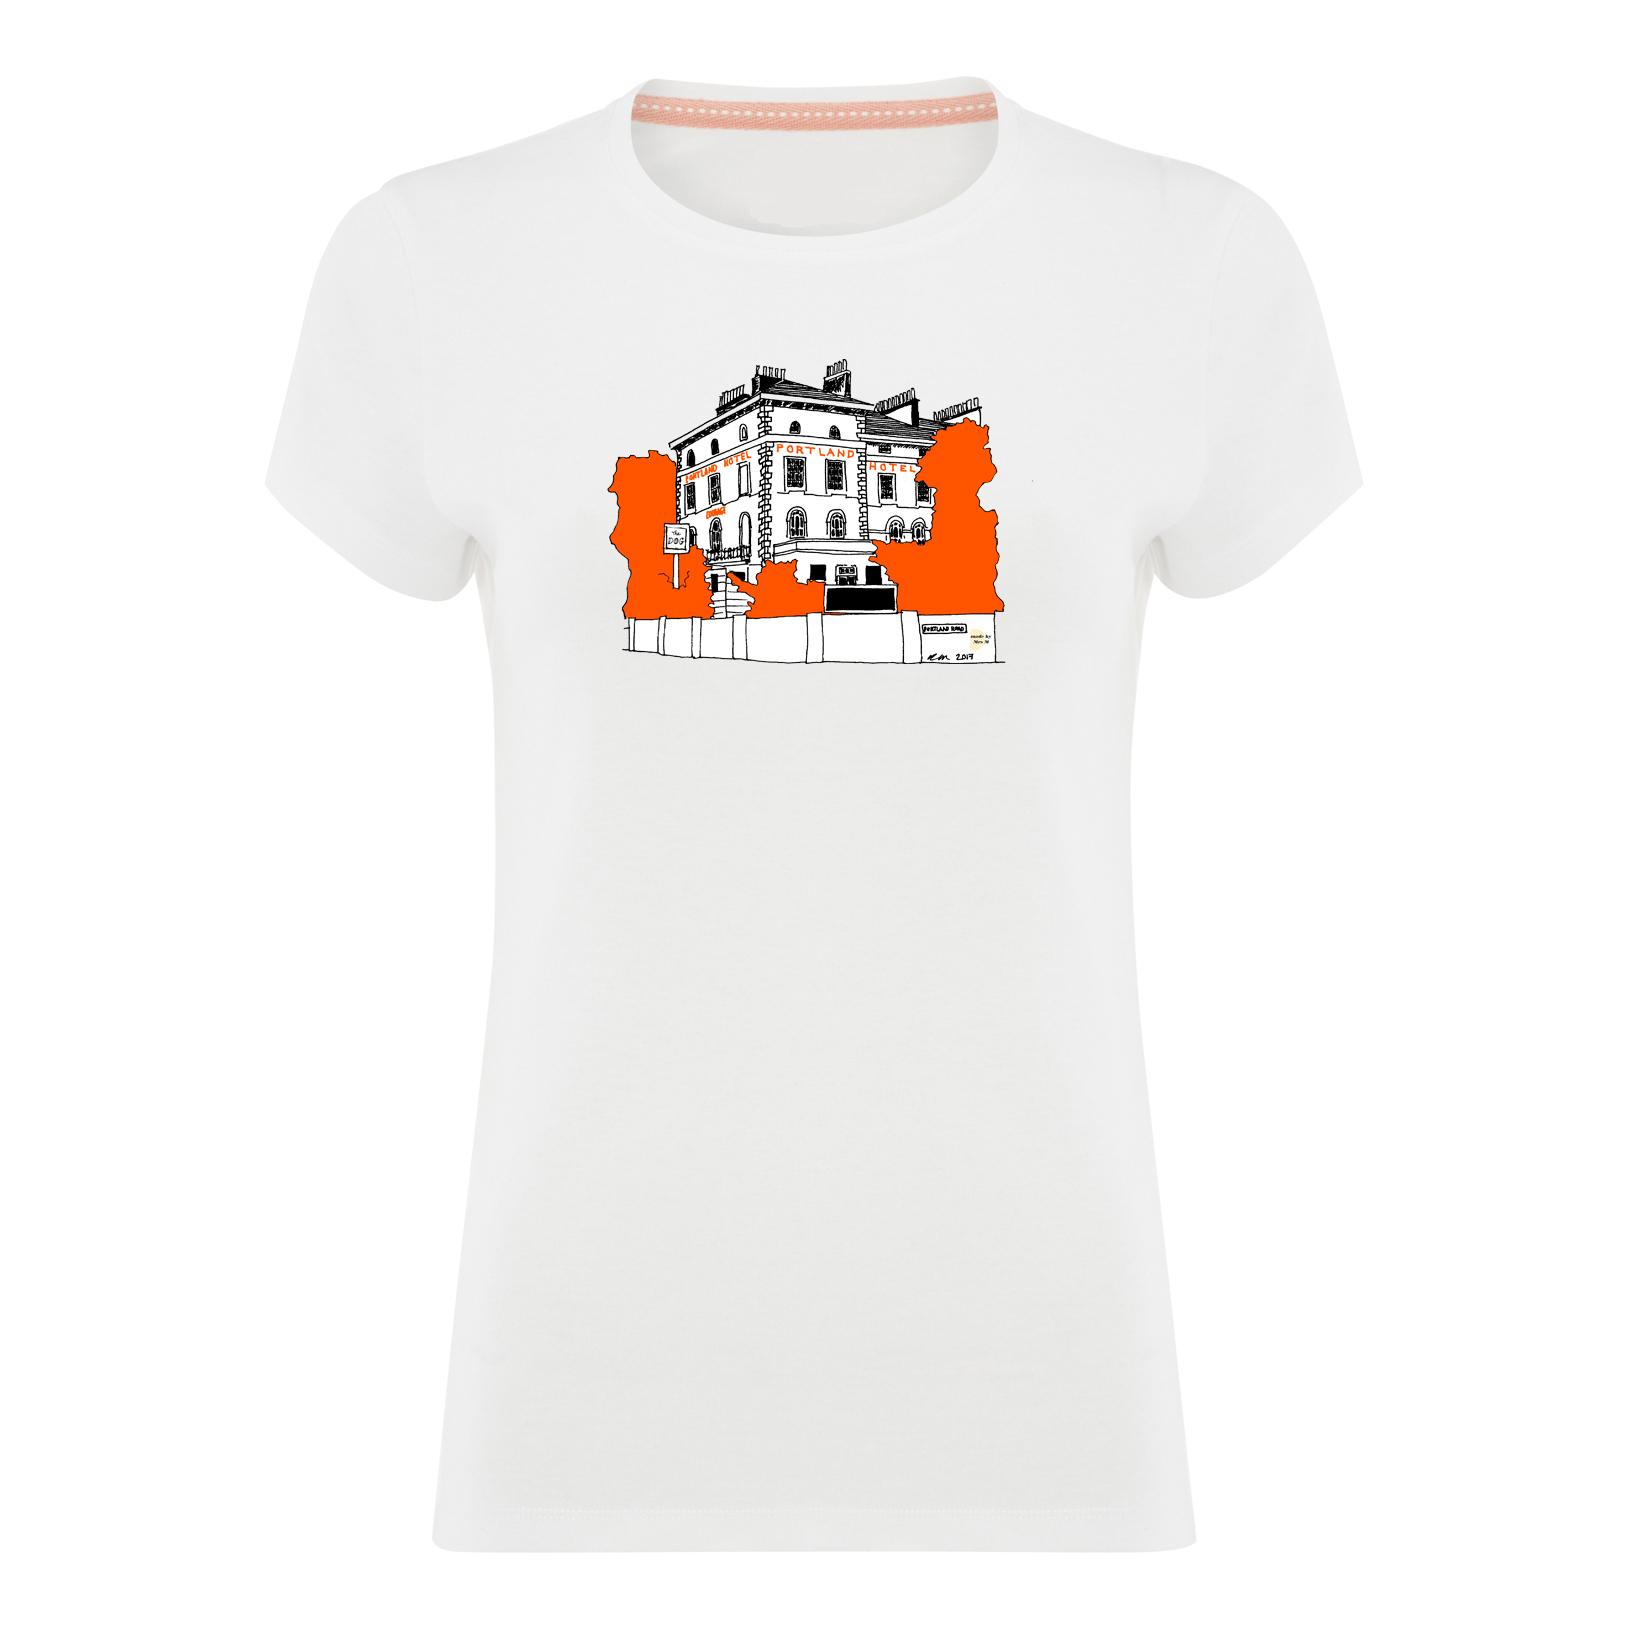 T Shirt Mock Up Square.jpg